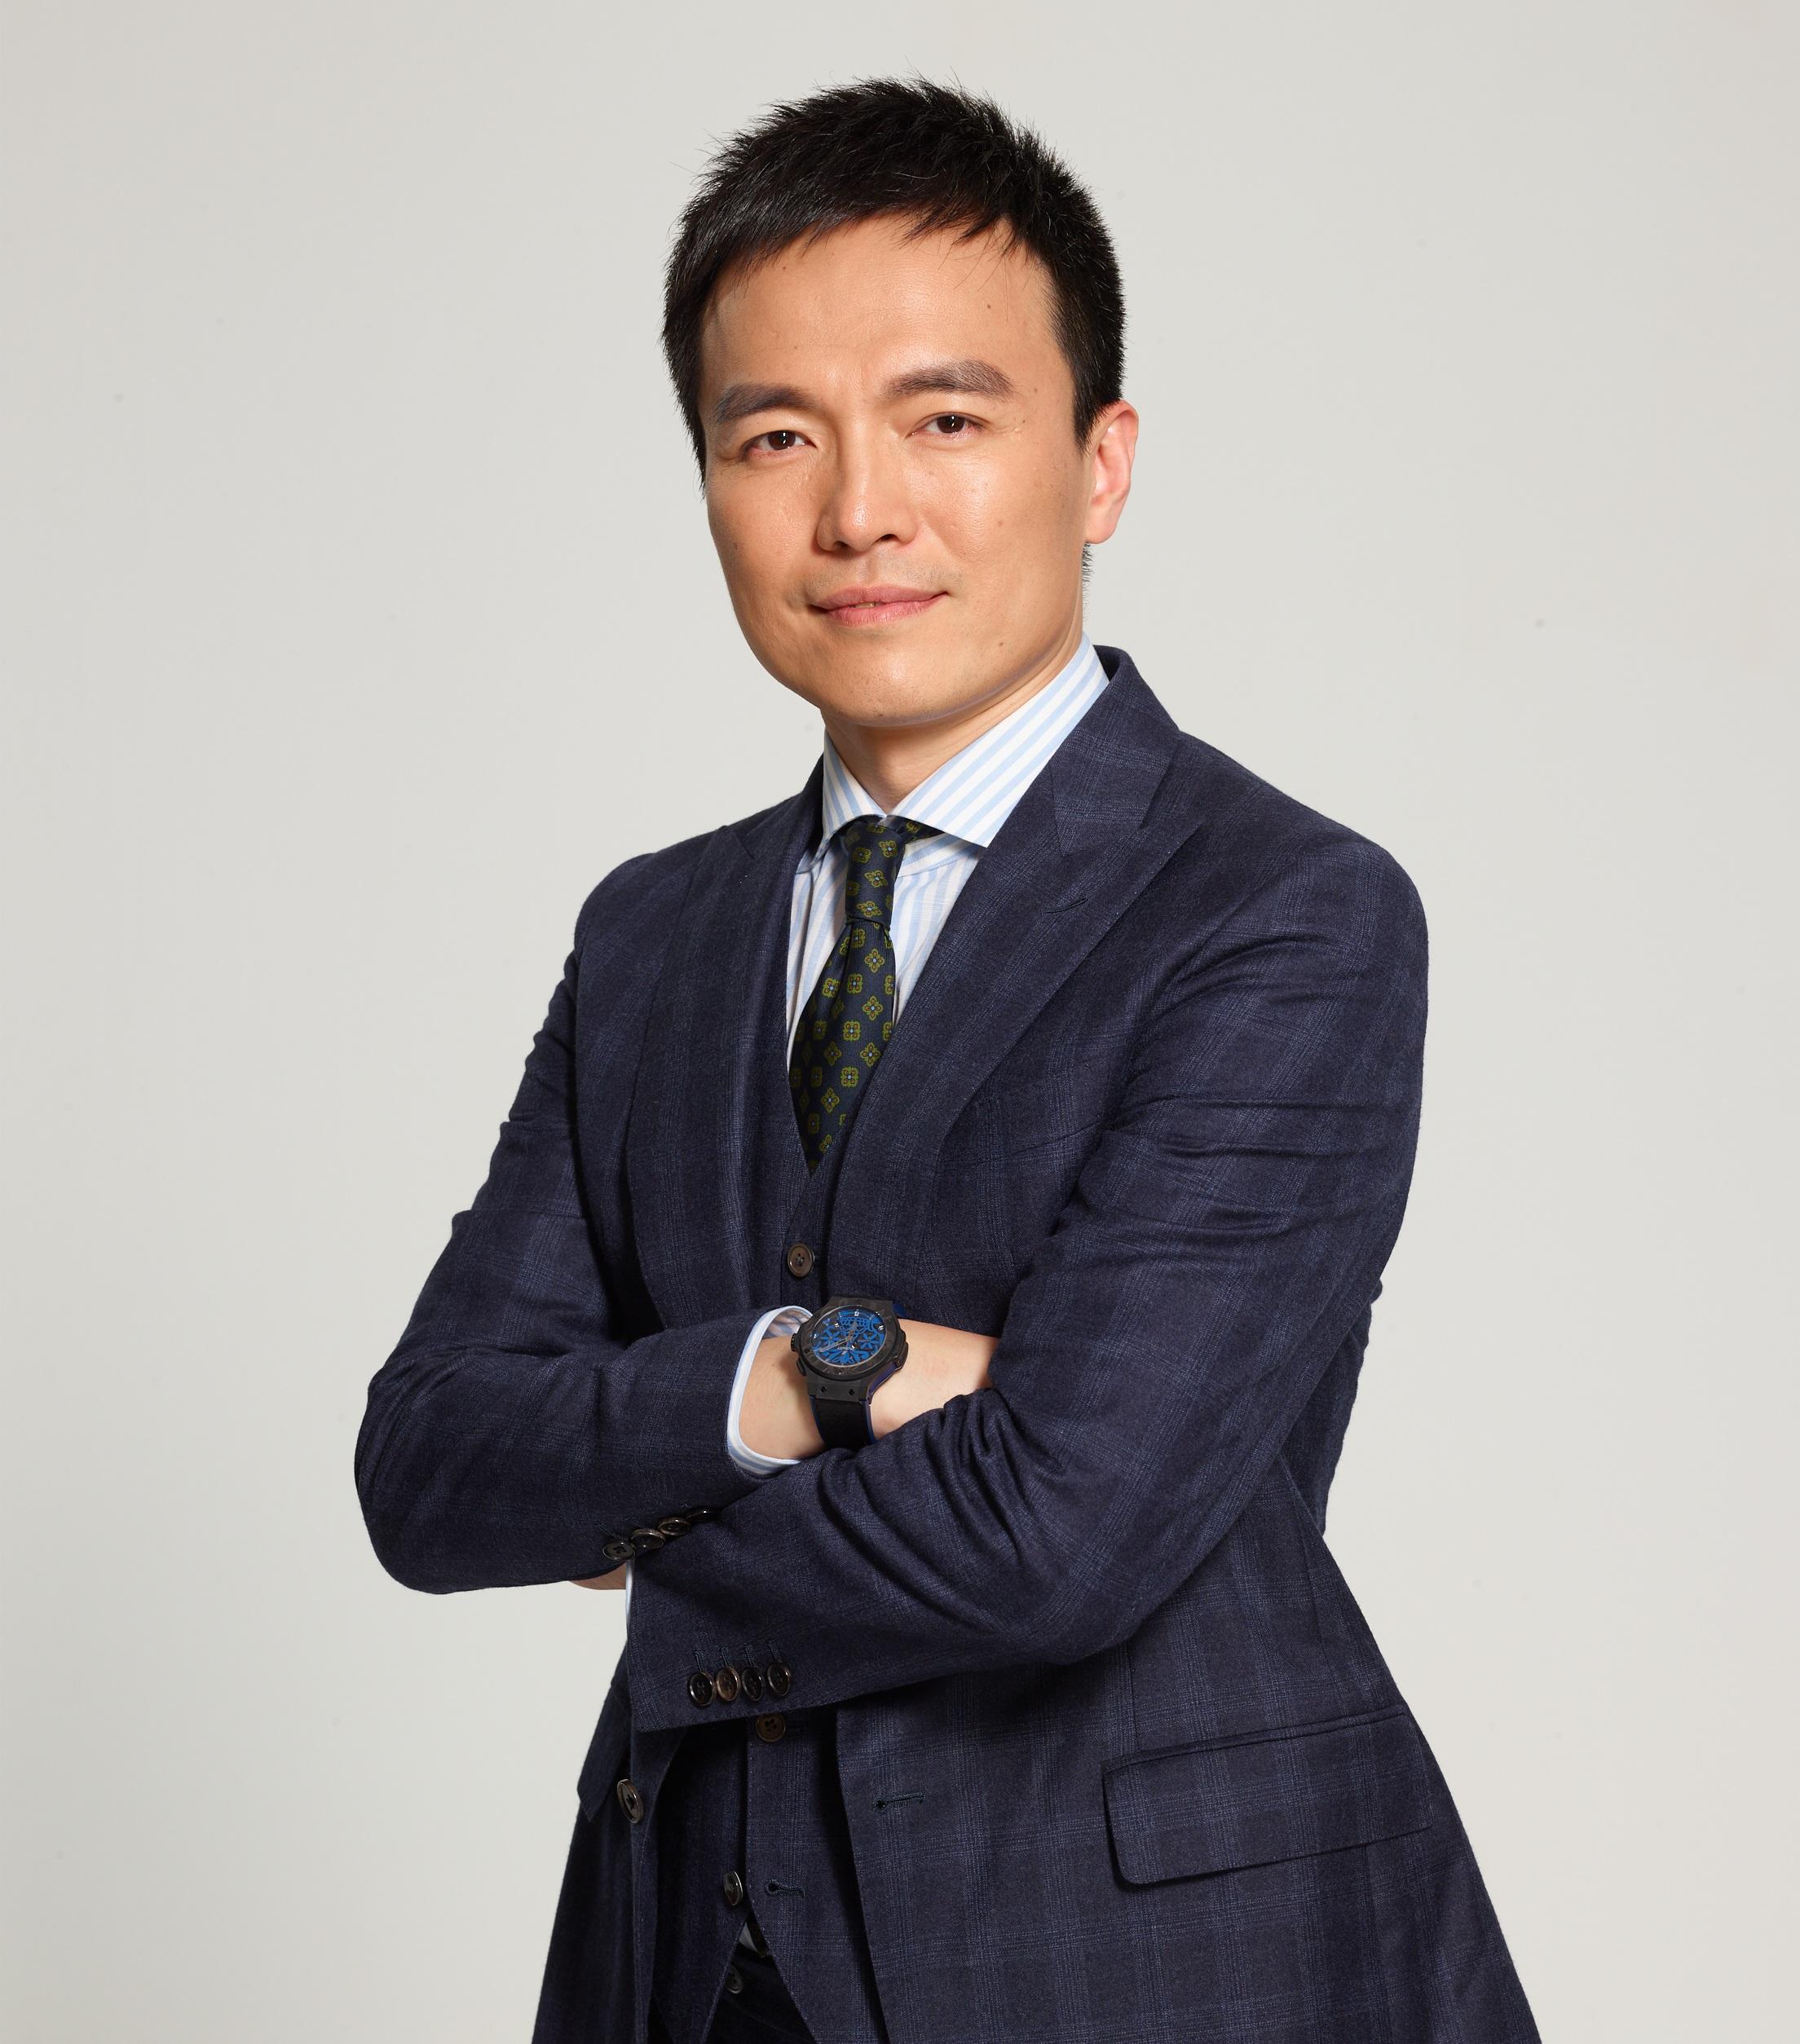 Derek+Haoyang+Li_founder+of+Suqirrel+AI.jpg